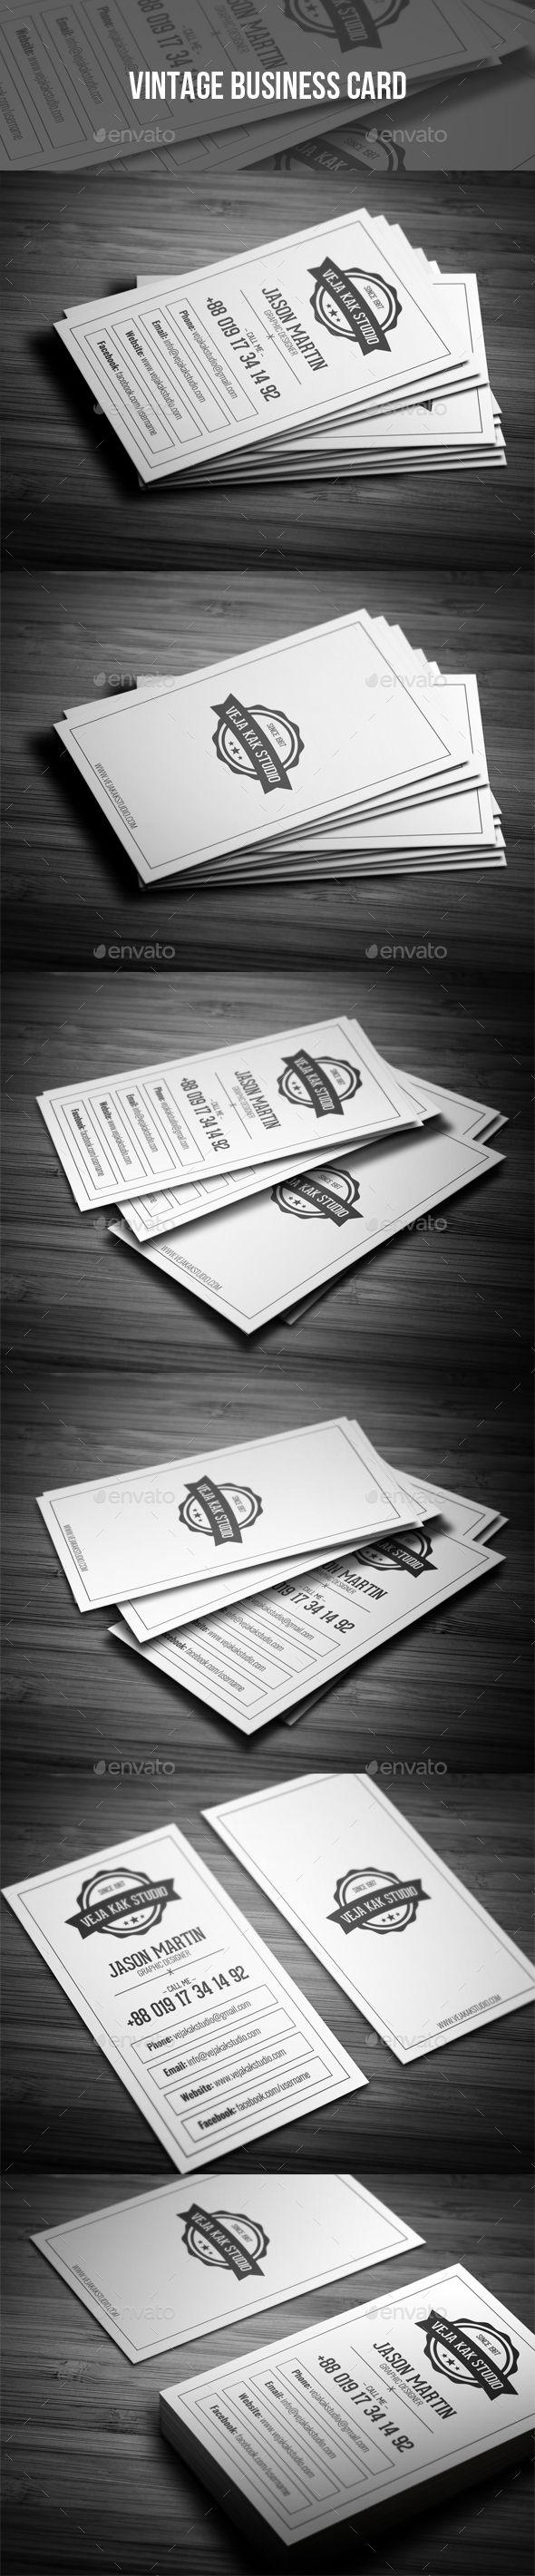 Vintage Business Card - Retro/Vintage Business Cards Download here : https://graphicriver.net/item/vintage-business-card/19396922?s_rank=11&ref=Al-fatih